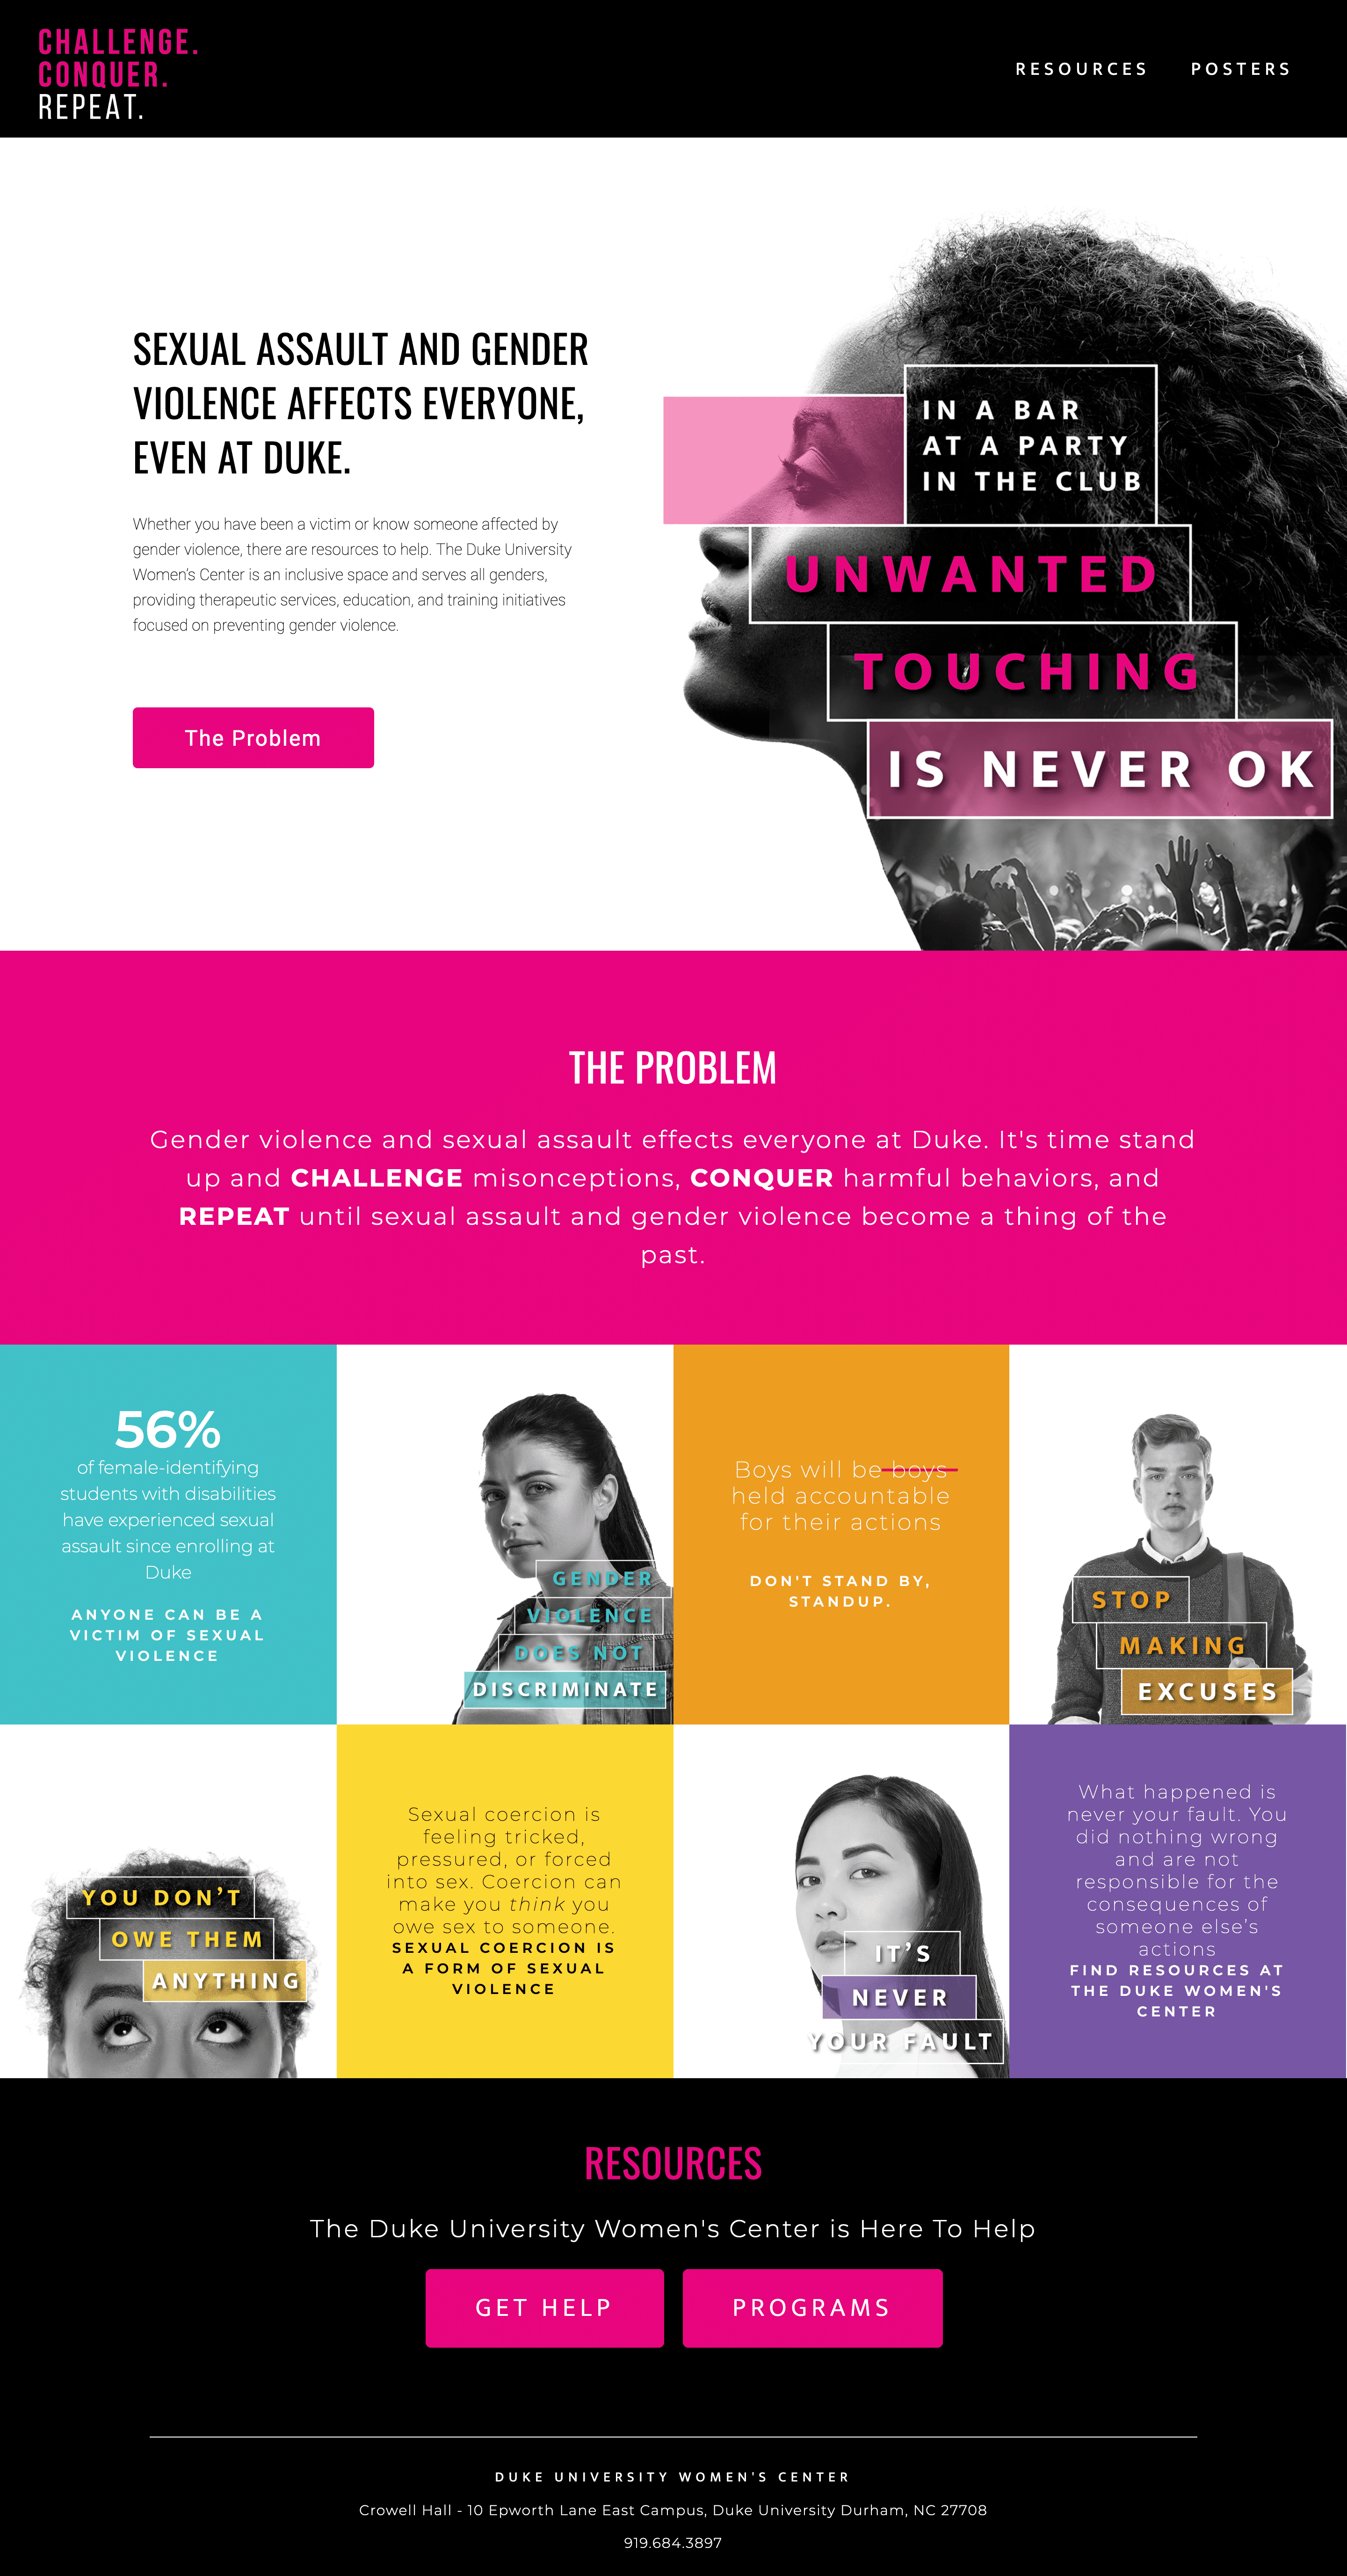 Duke Challenge Conquer Repeat website screenshot